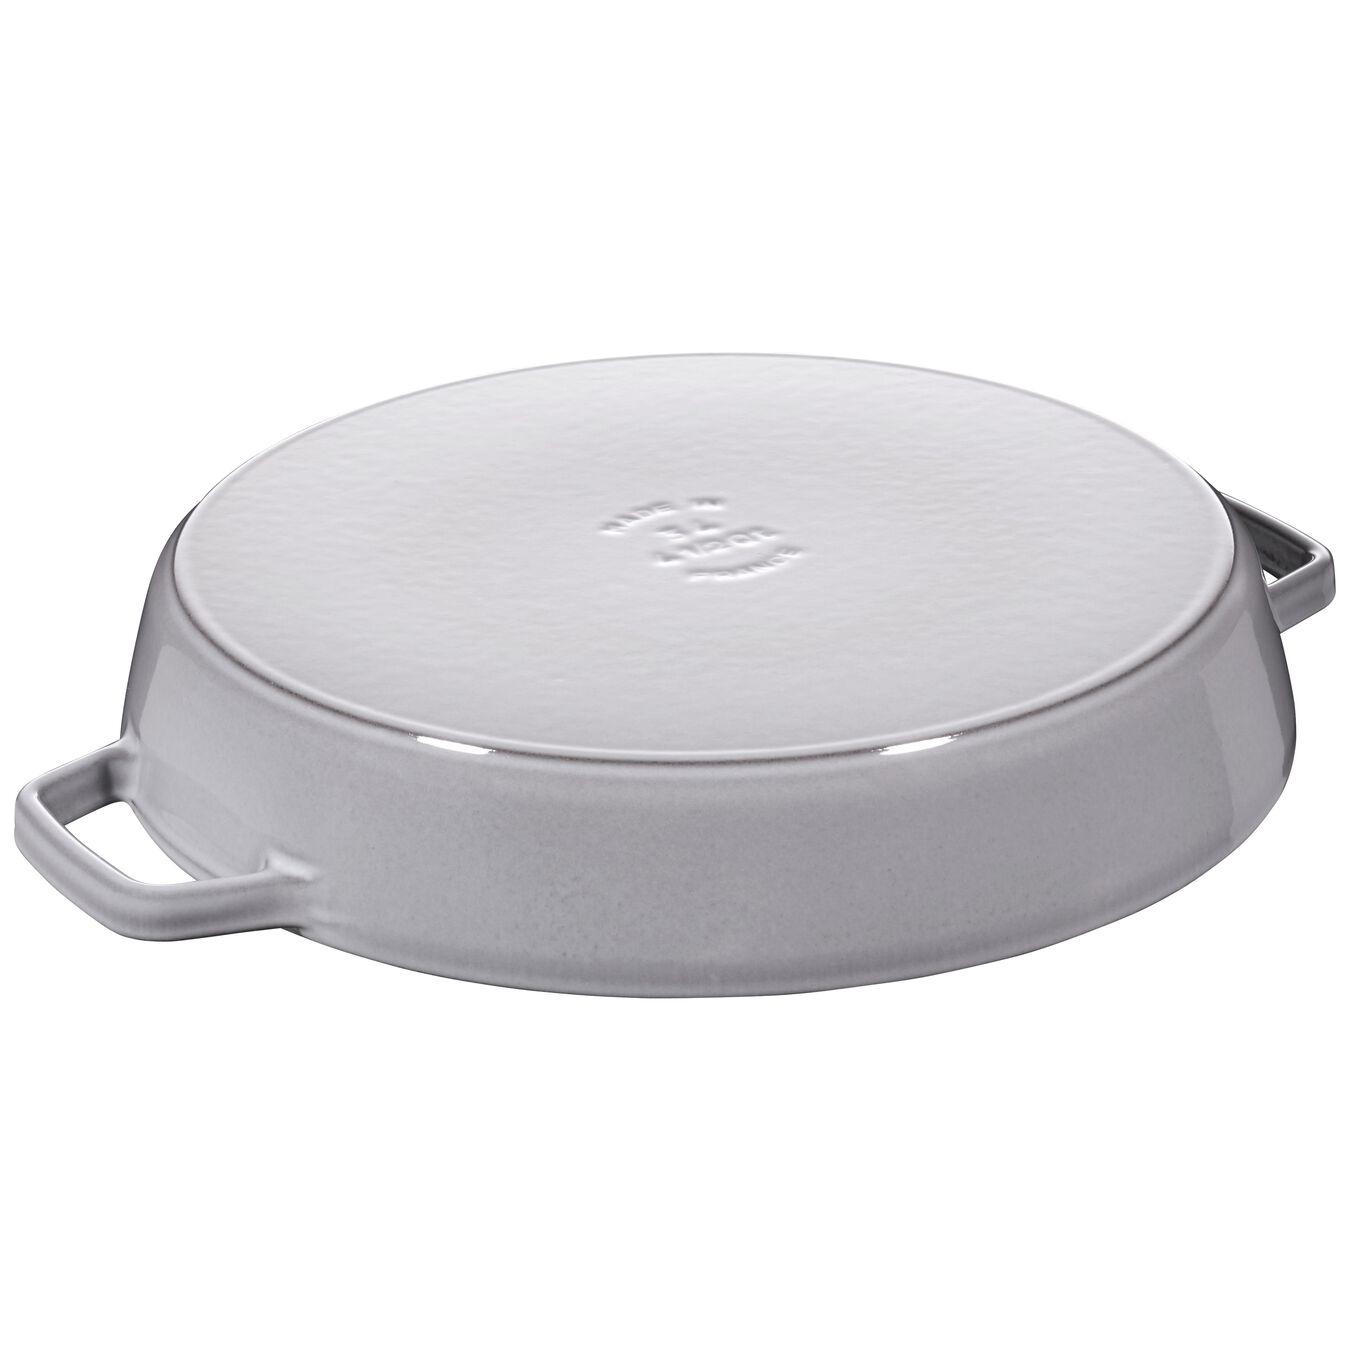 13.5-inch, Paella pan, graphite grey,,large 2